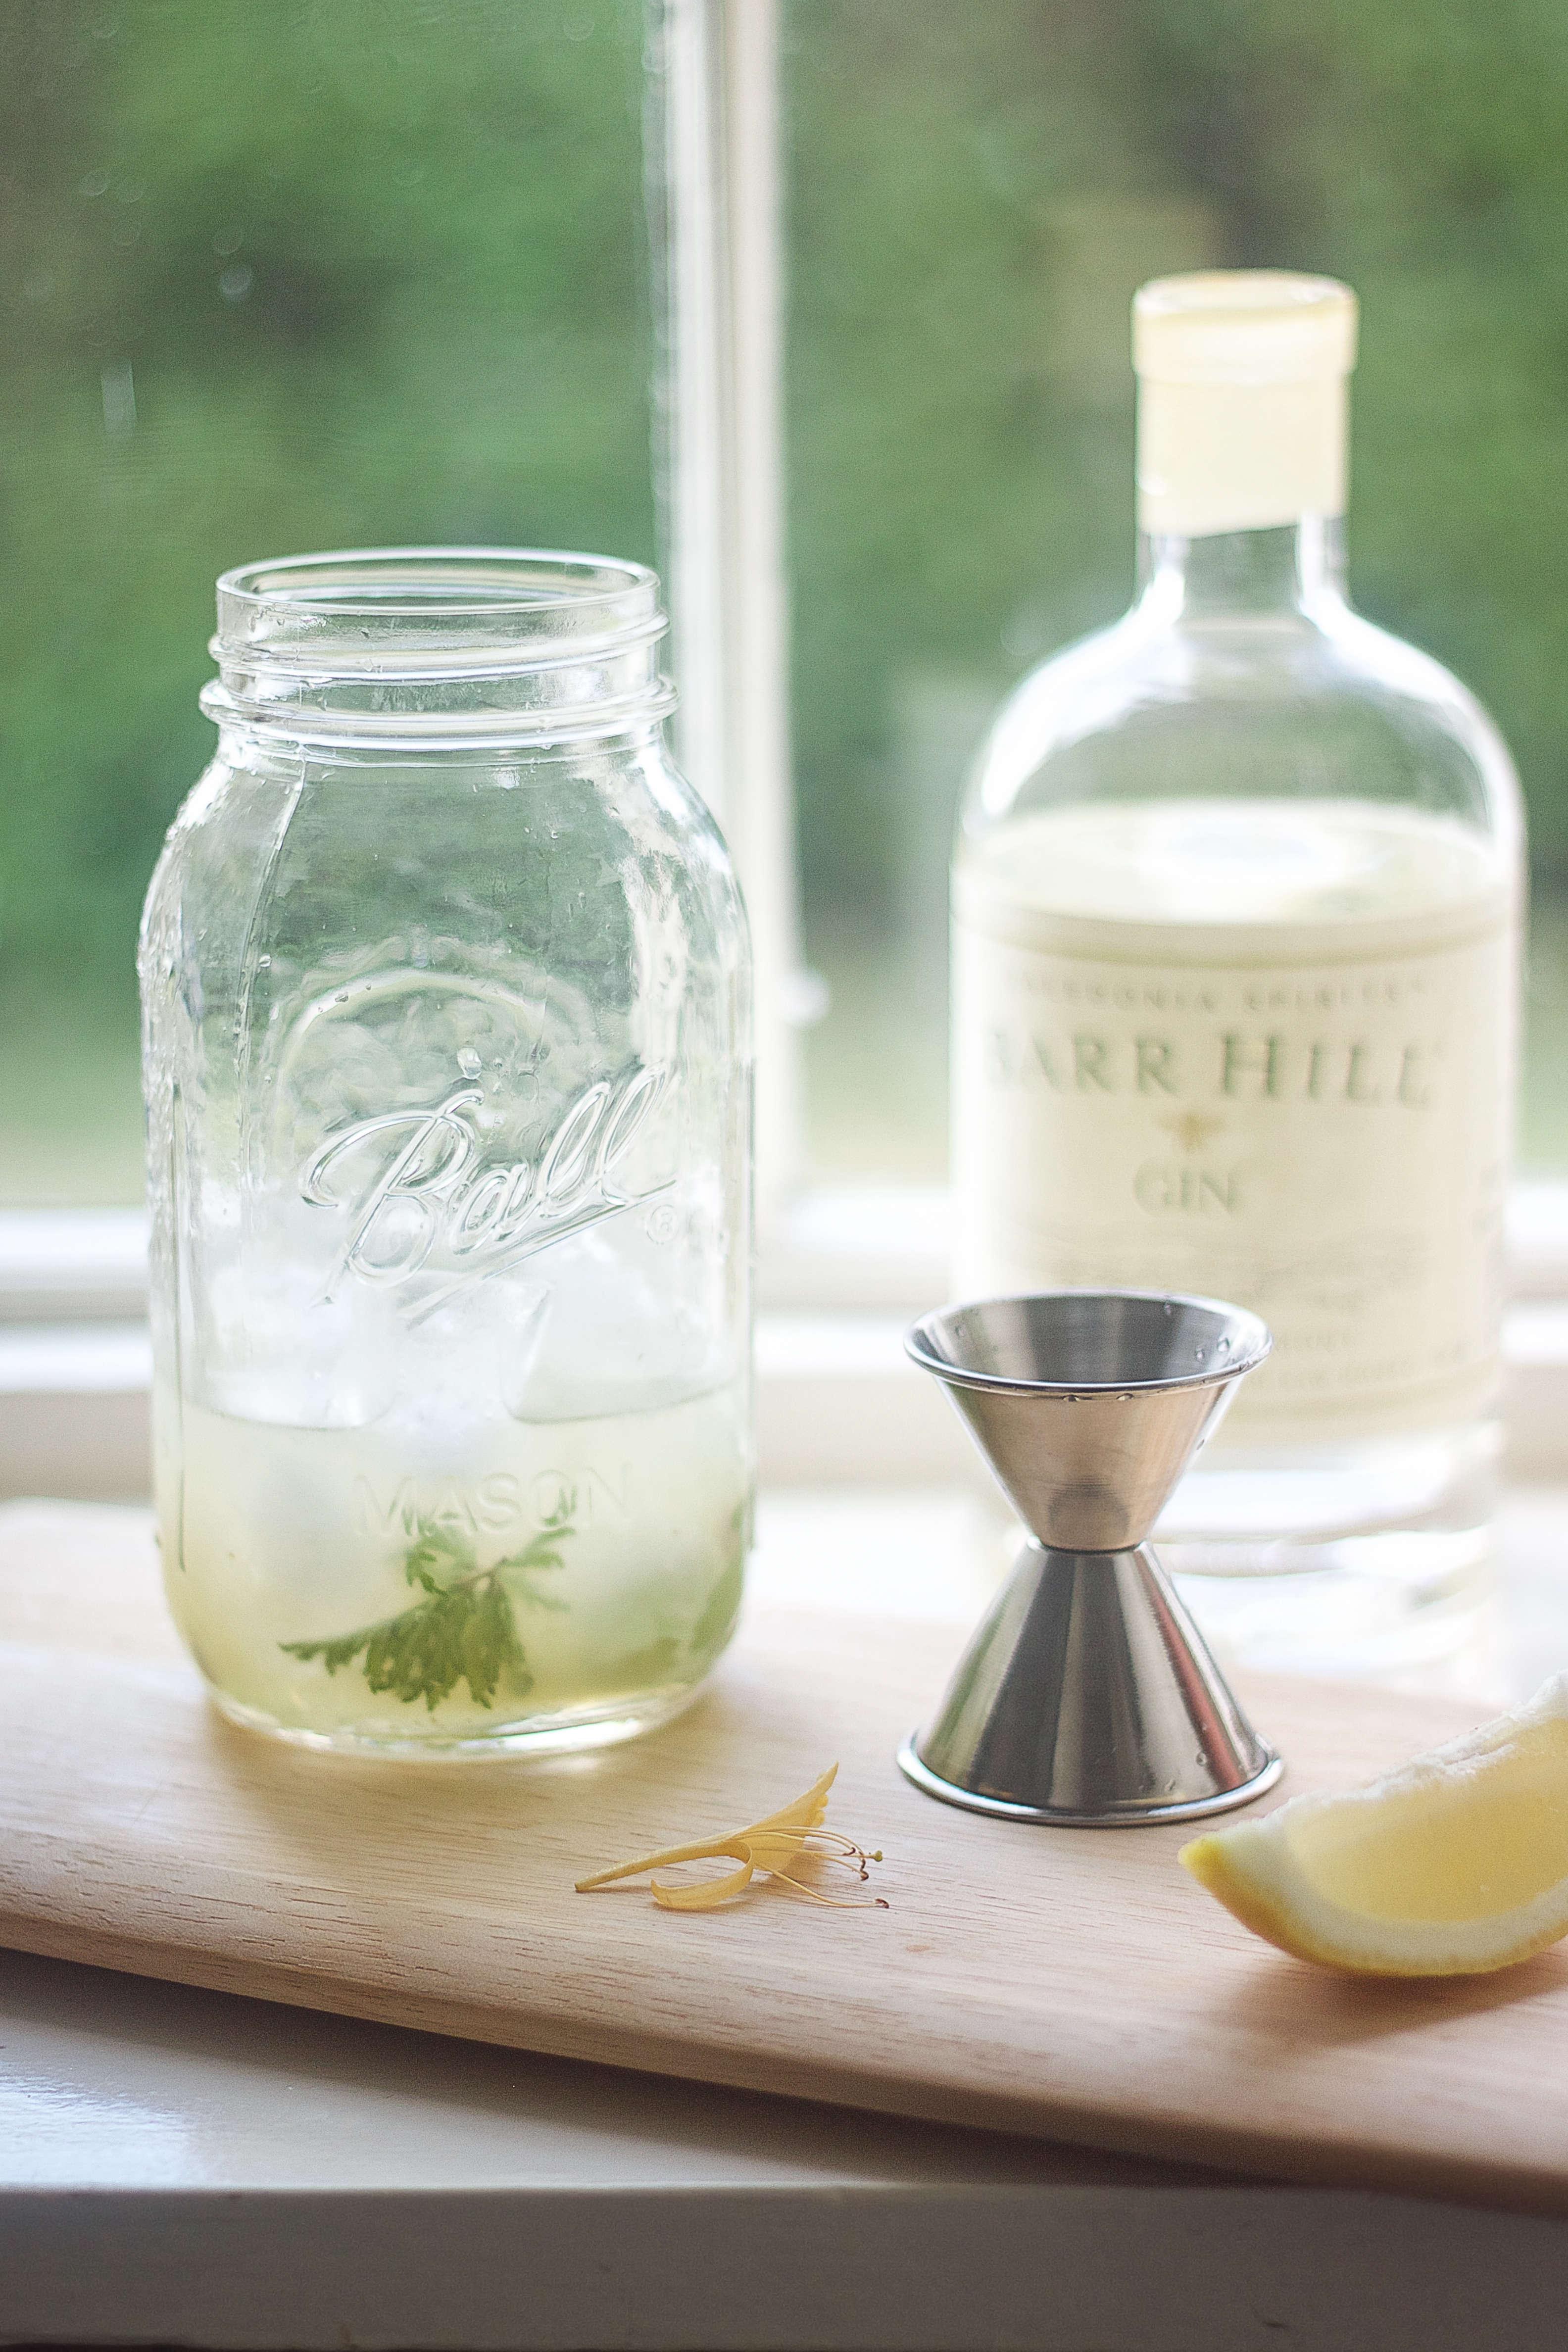 Diy Summer Cocktail With Rose Geranium Simple Syrup Gardenista